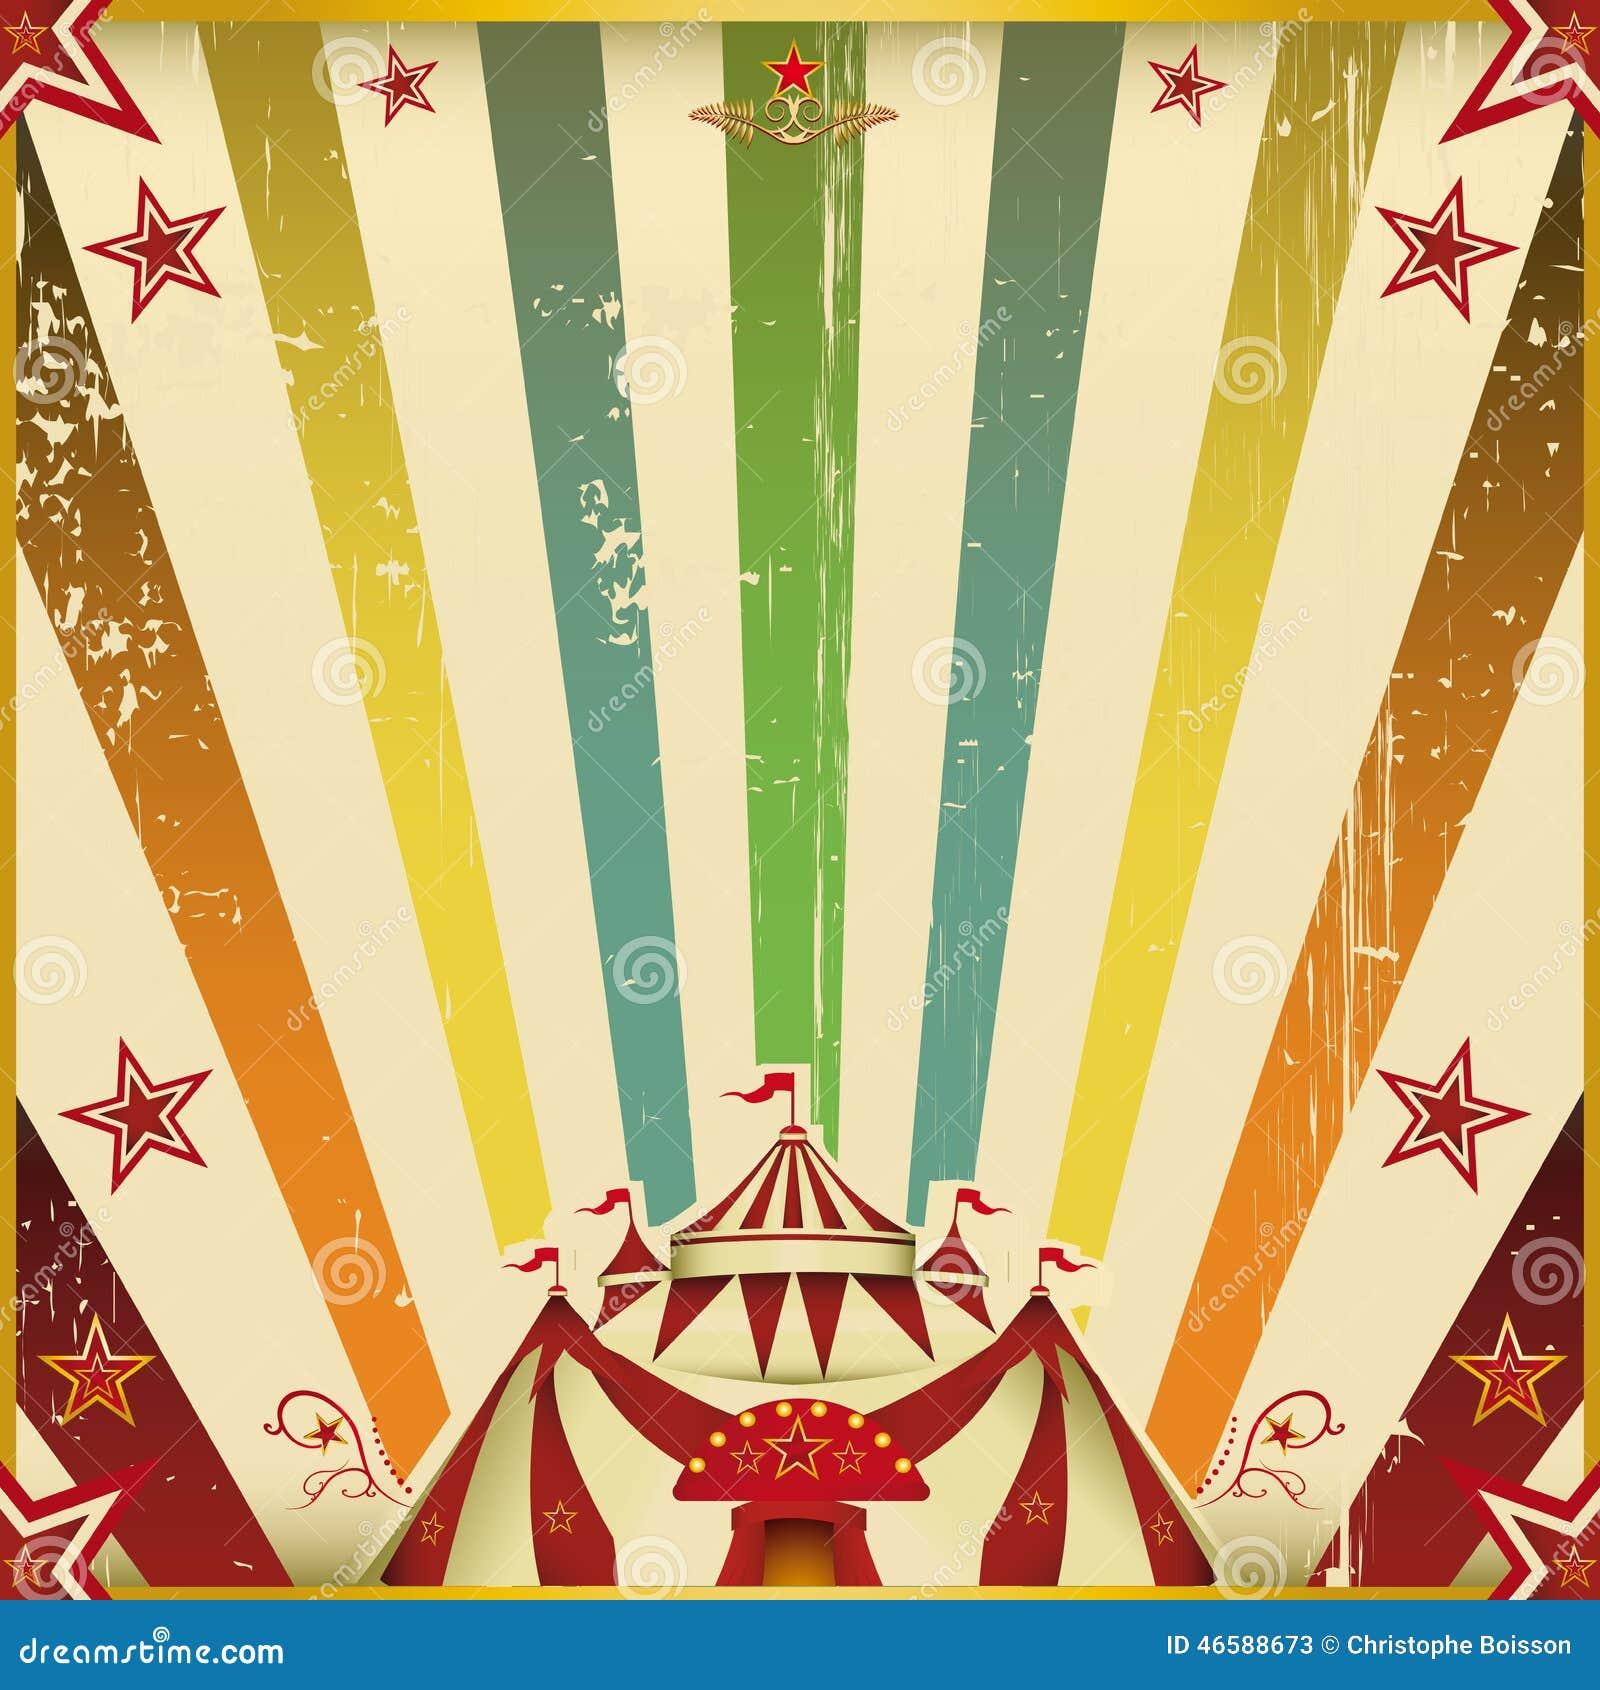 Carnival Ticket Invitation is nice invitations example